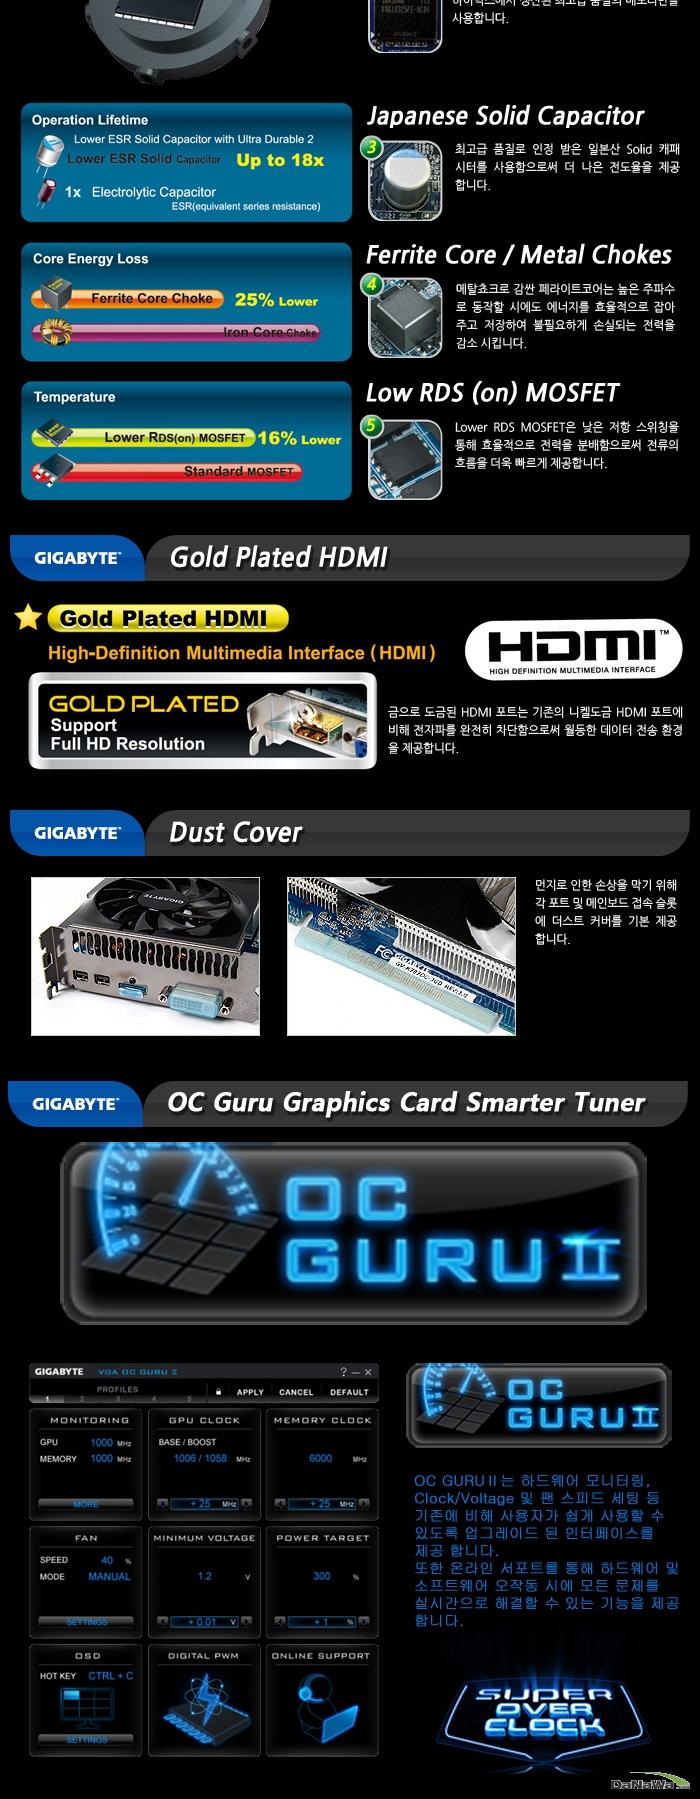 GIGABYTE 지포스 GTX 770 UDV D5 2GD WINDFORCE METAL의 제작사 이미지